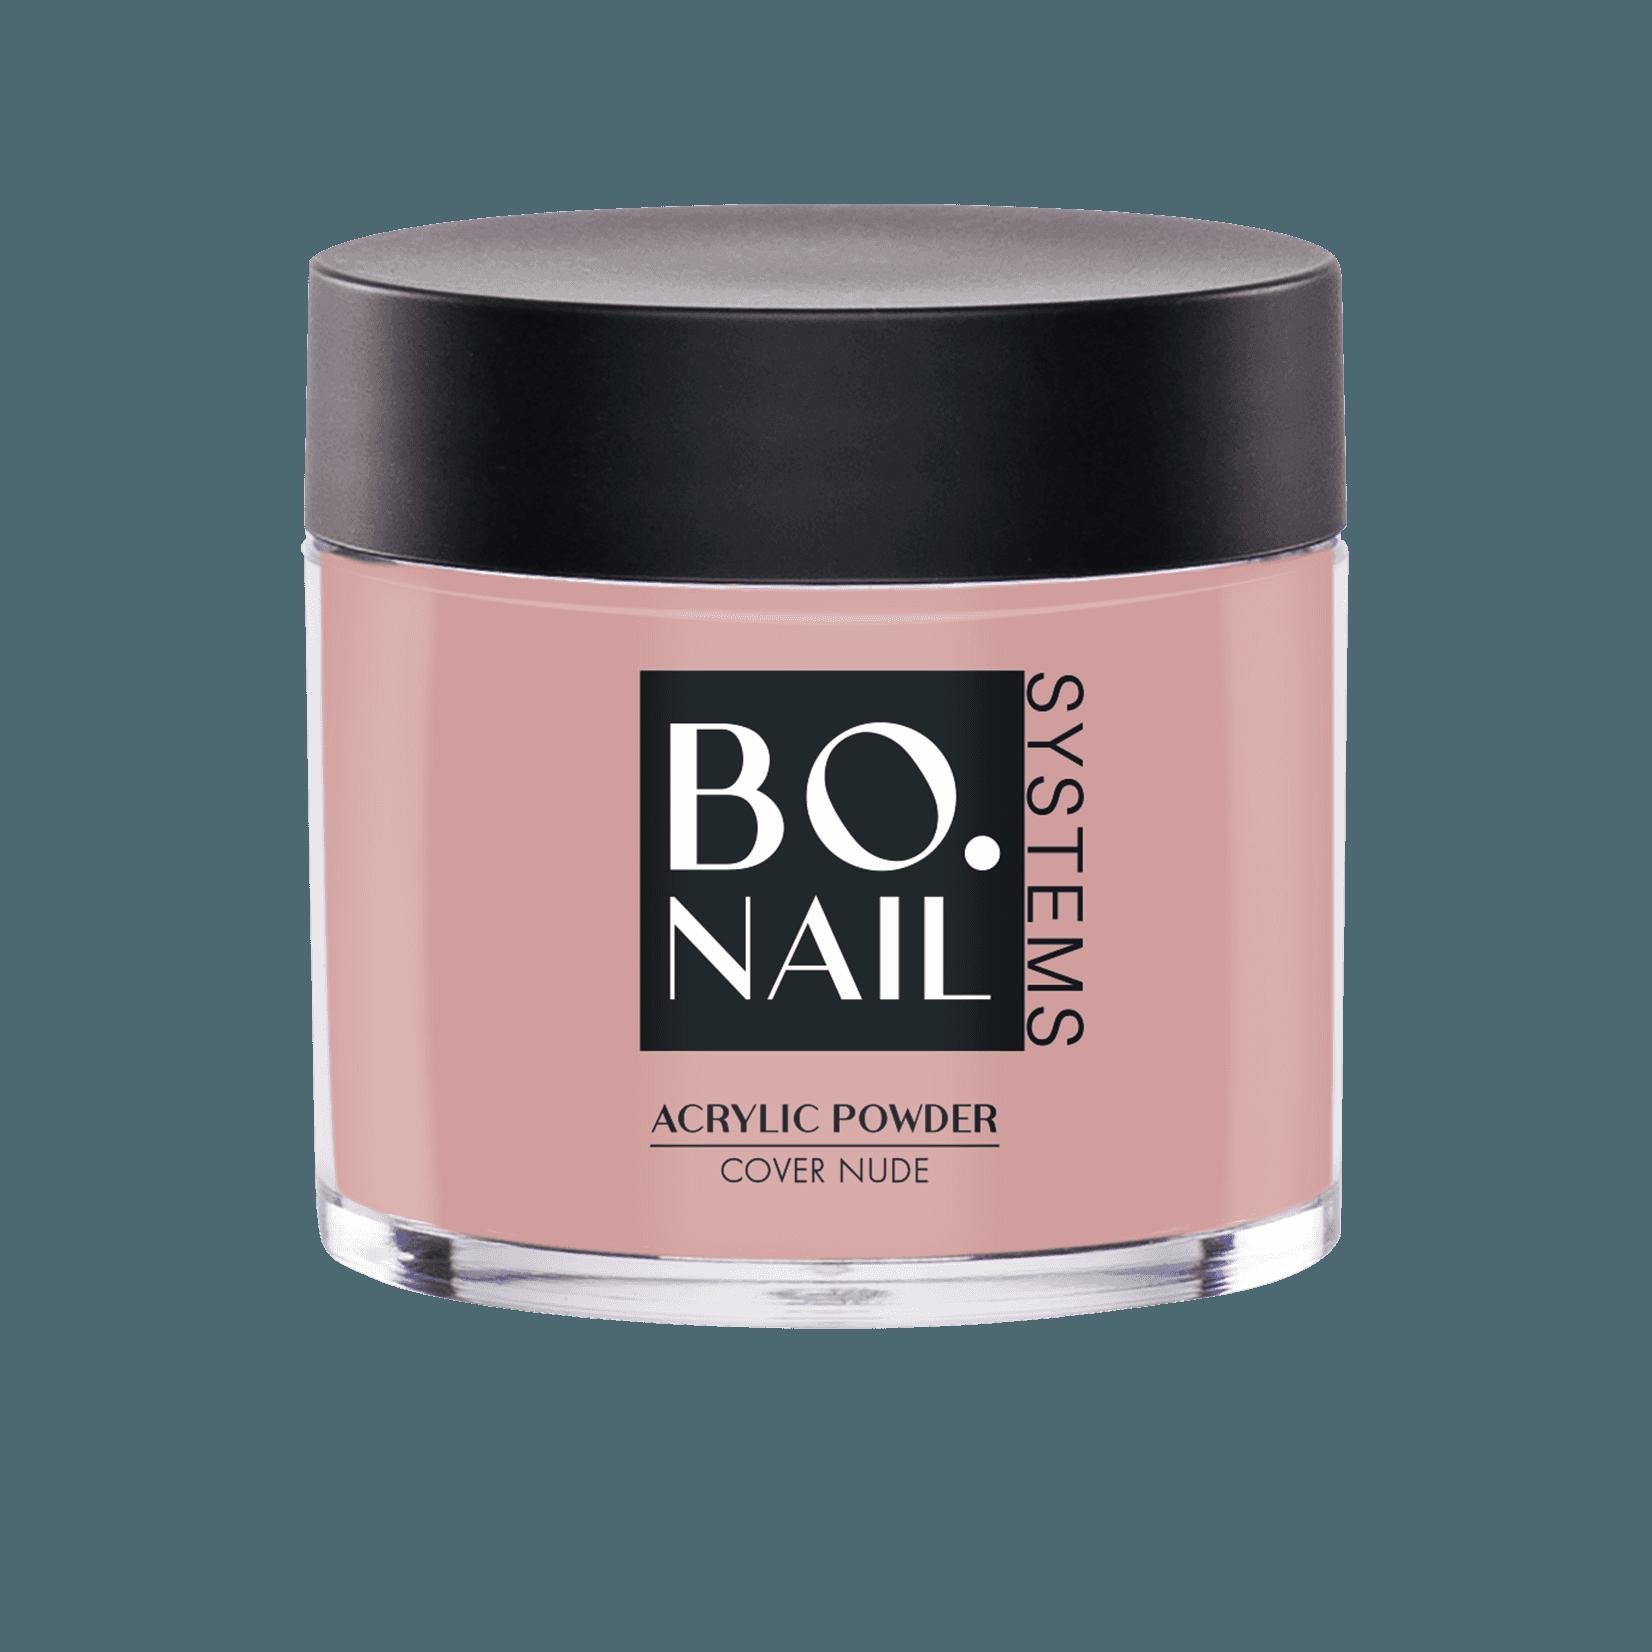 BO Acrylic Powder 25gr - Cover Nude